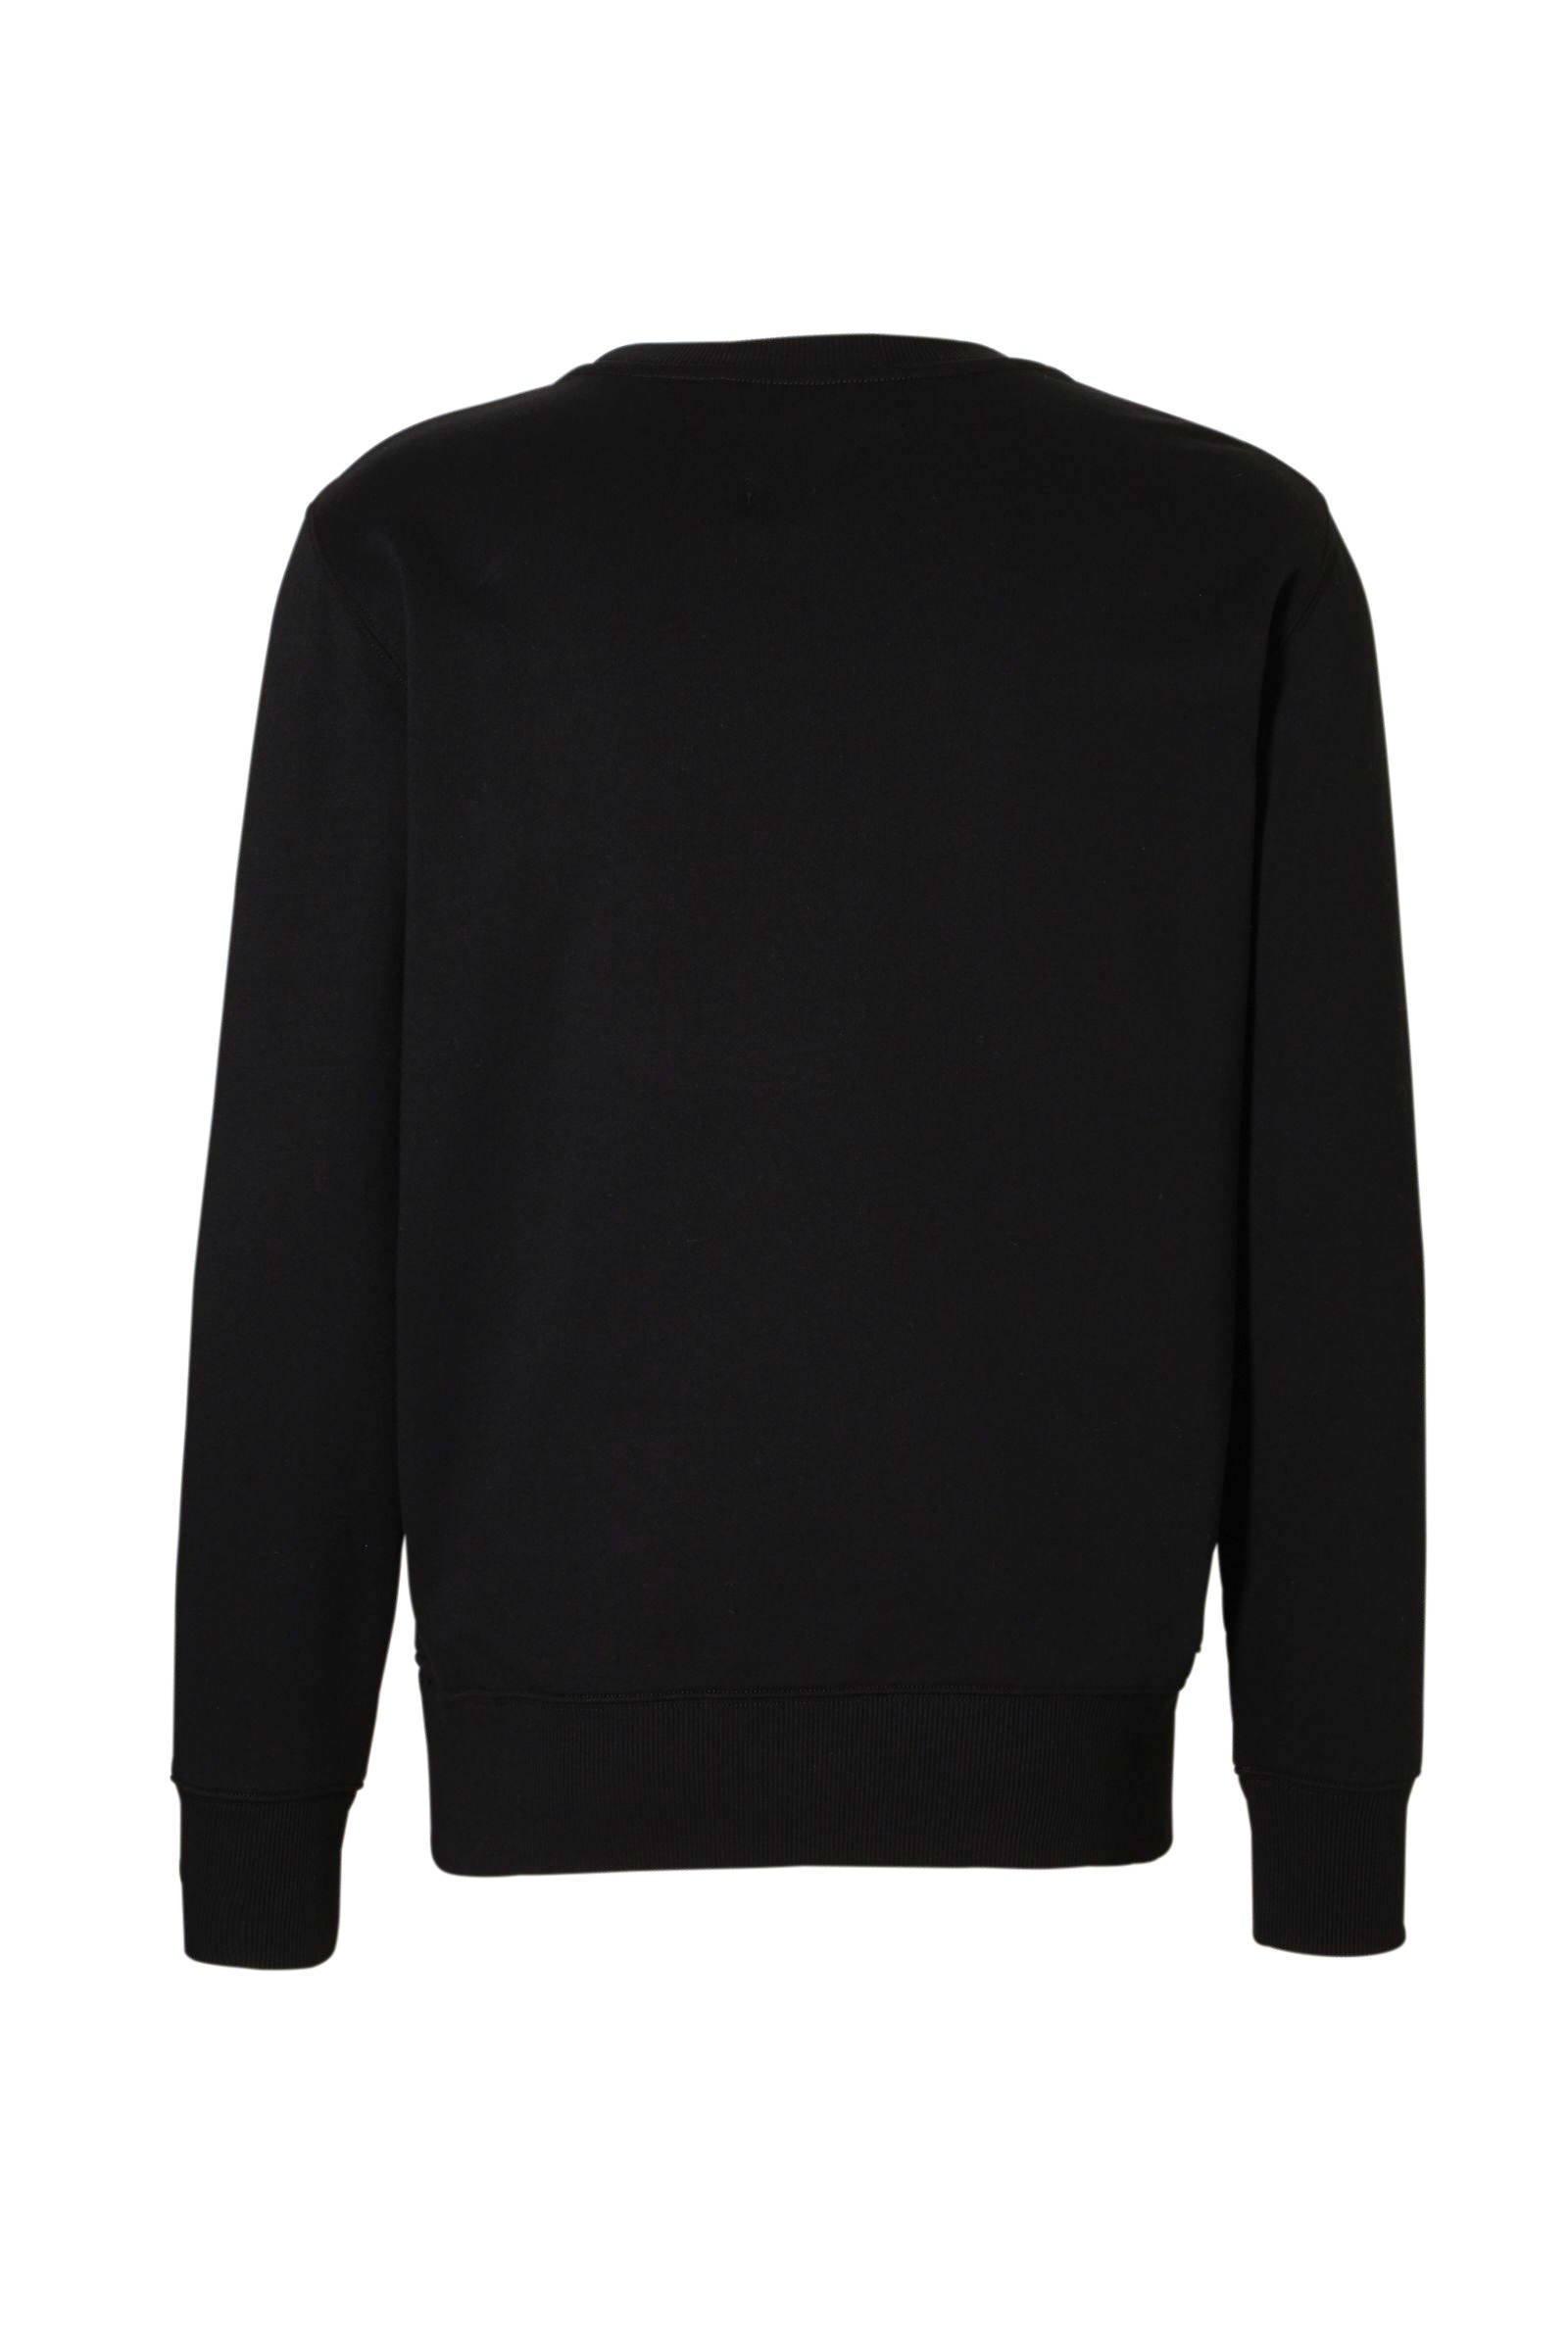 G sweater RAW Star Star RAW G Ocelat sweater Star RAW G Ocelat rrUTBw